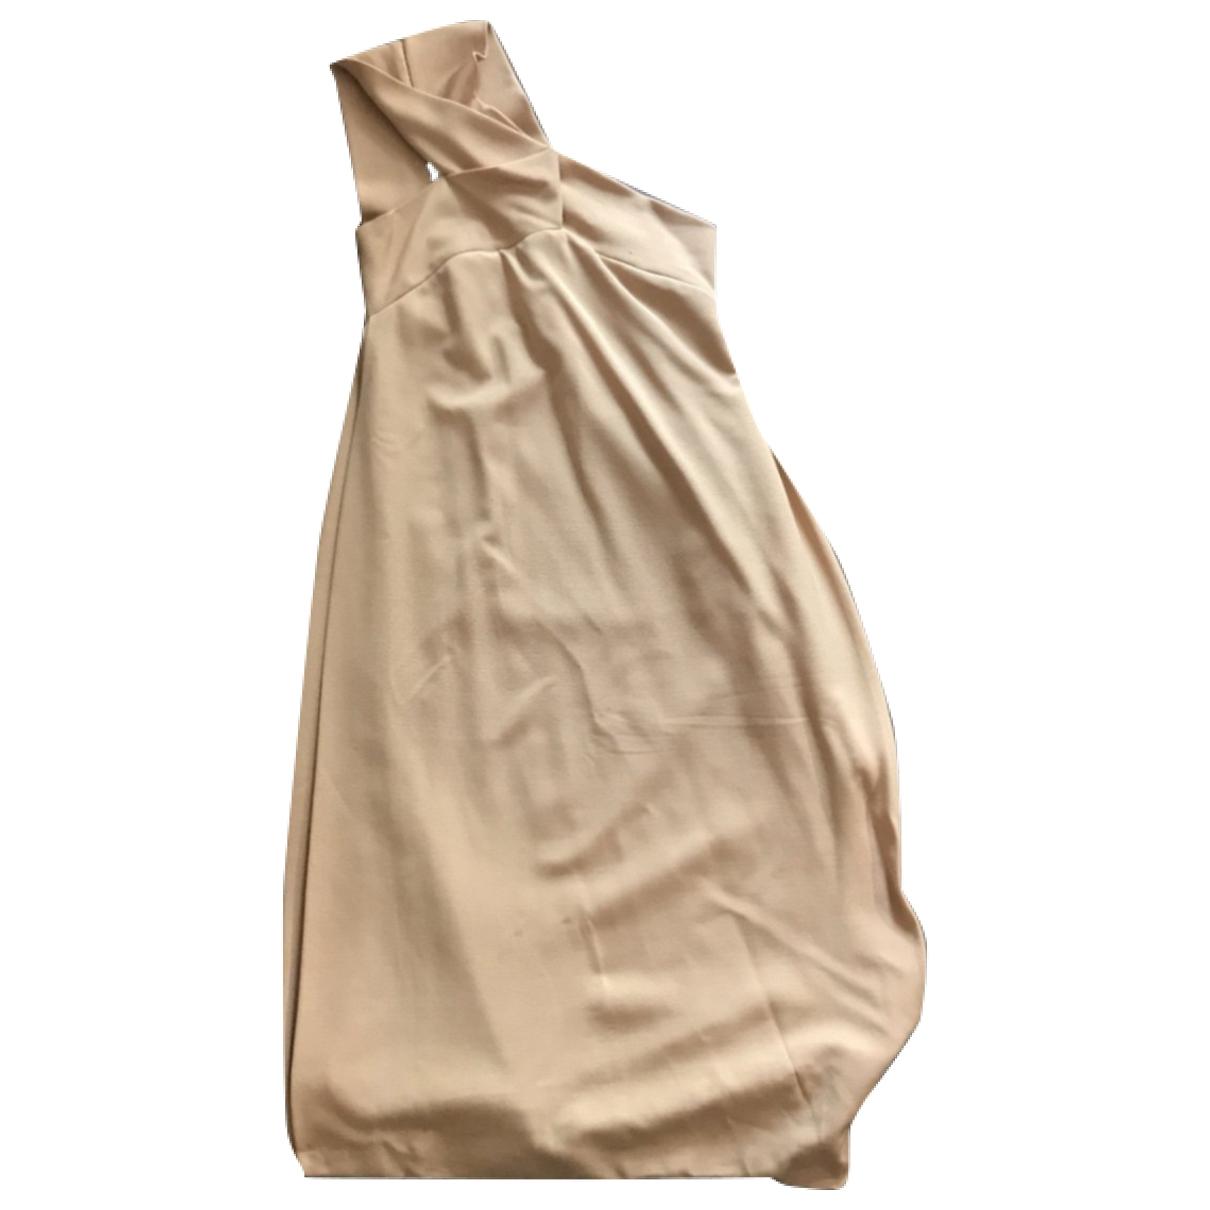 Bottega Veneta \N Beige dress for Women 40 IT